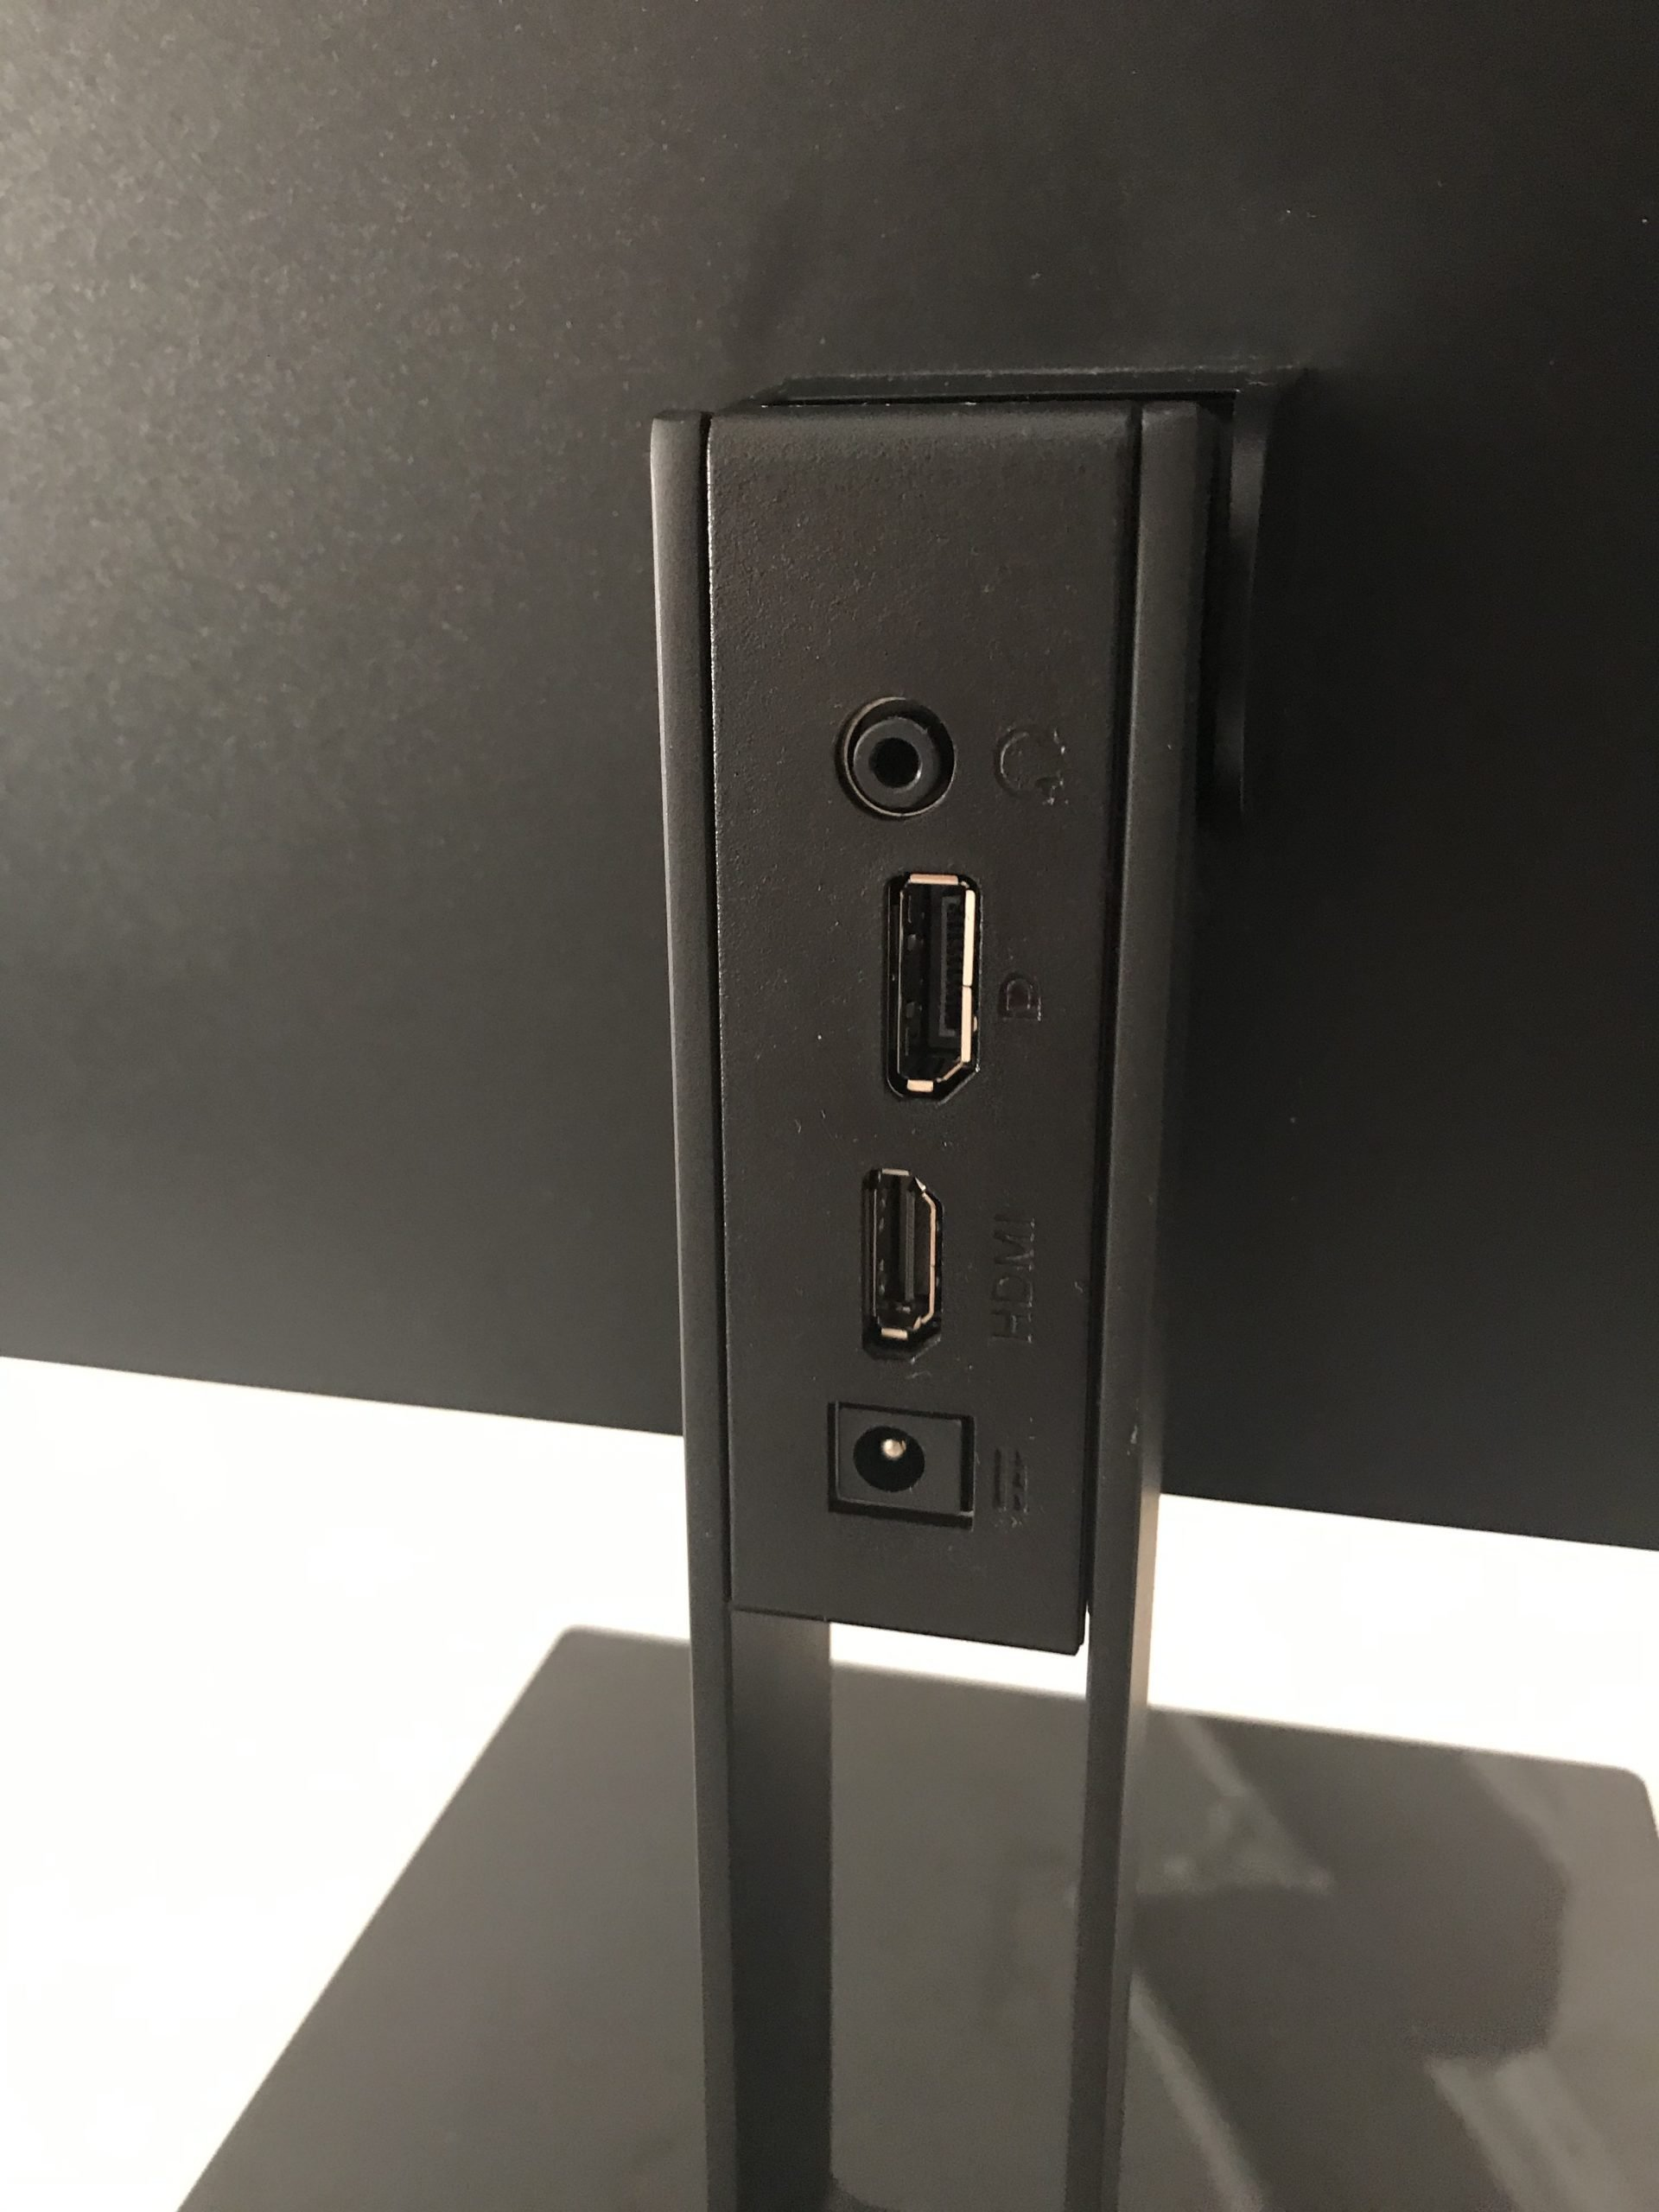 İncecik Bir Ekran İncelemesi: AOC 27V2Q Full HD Monitör